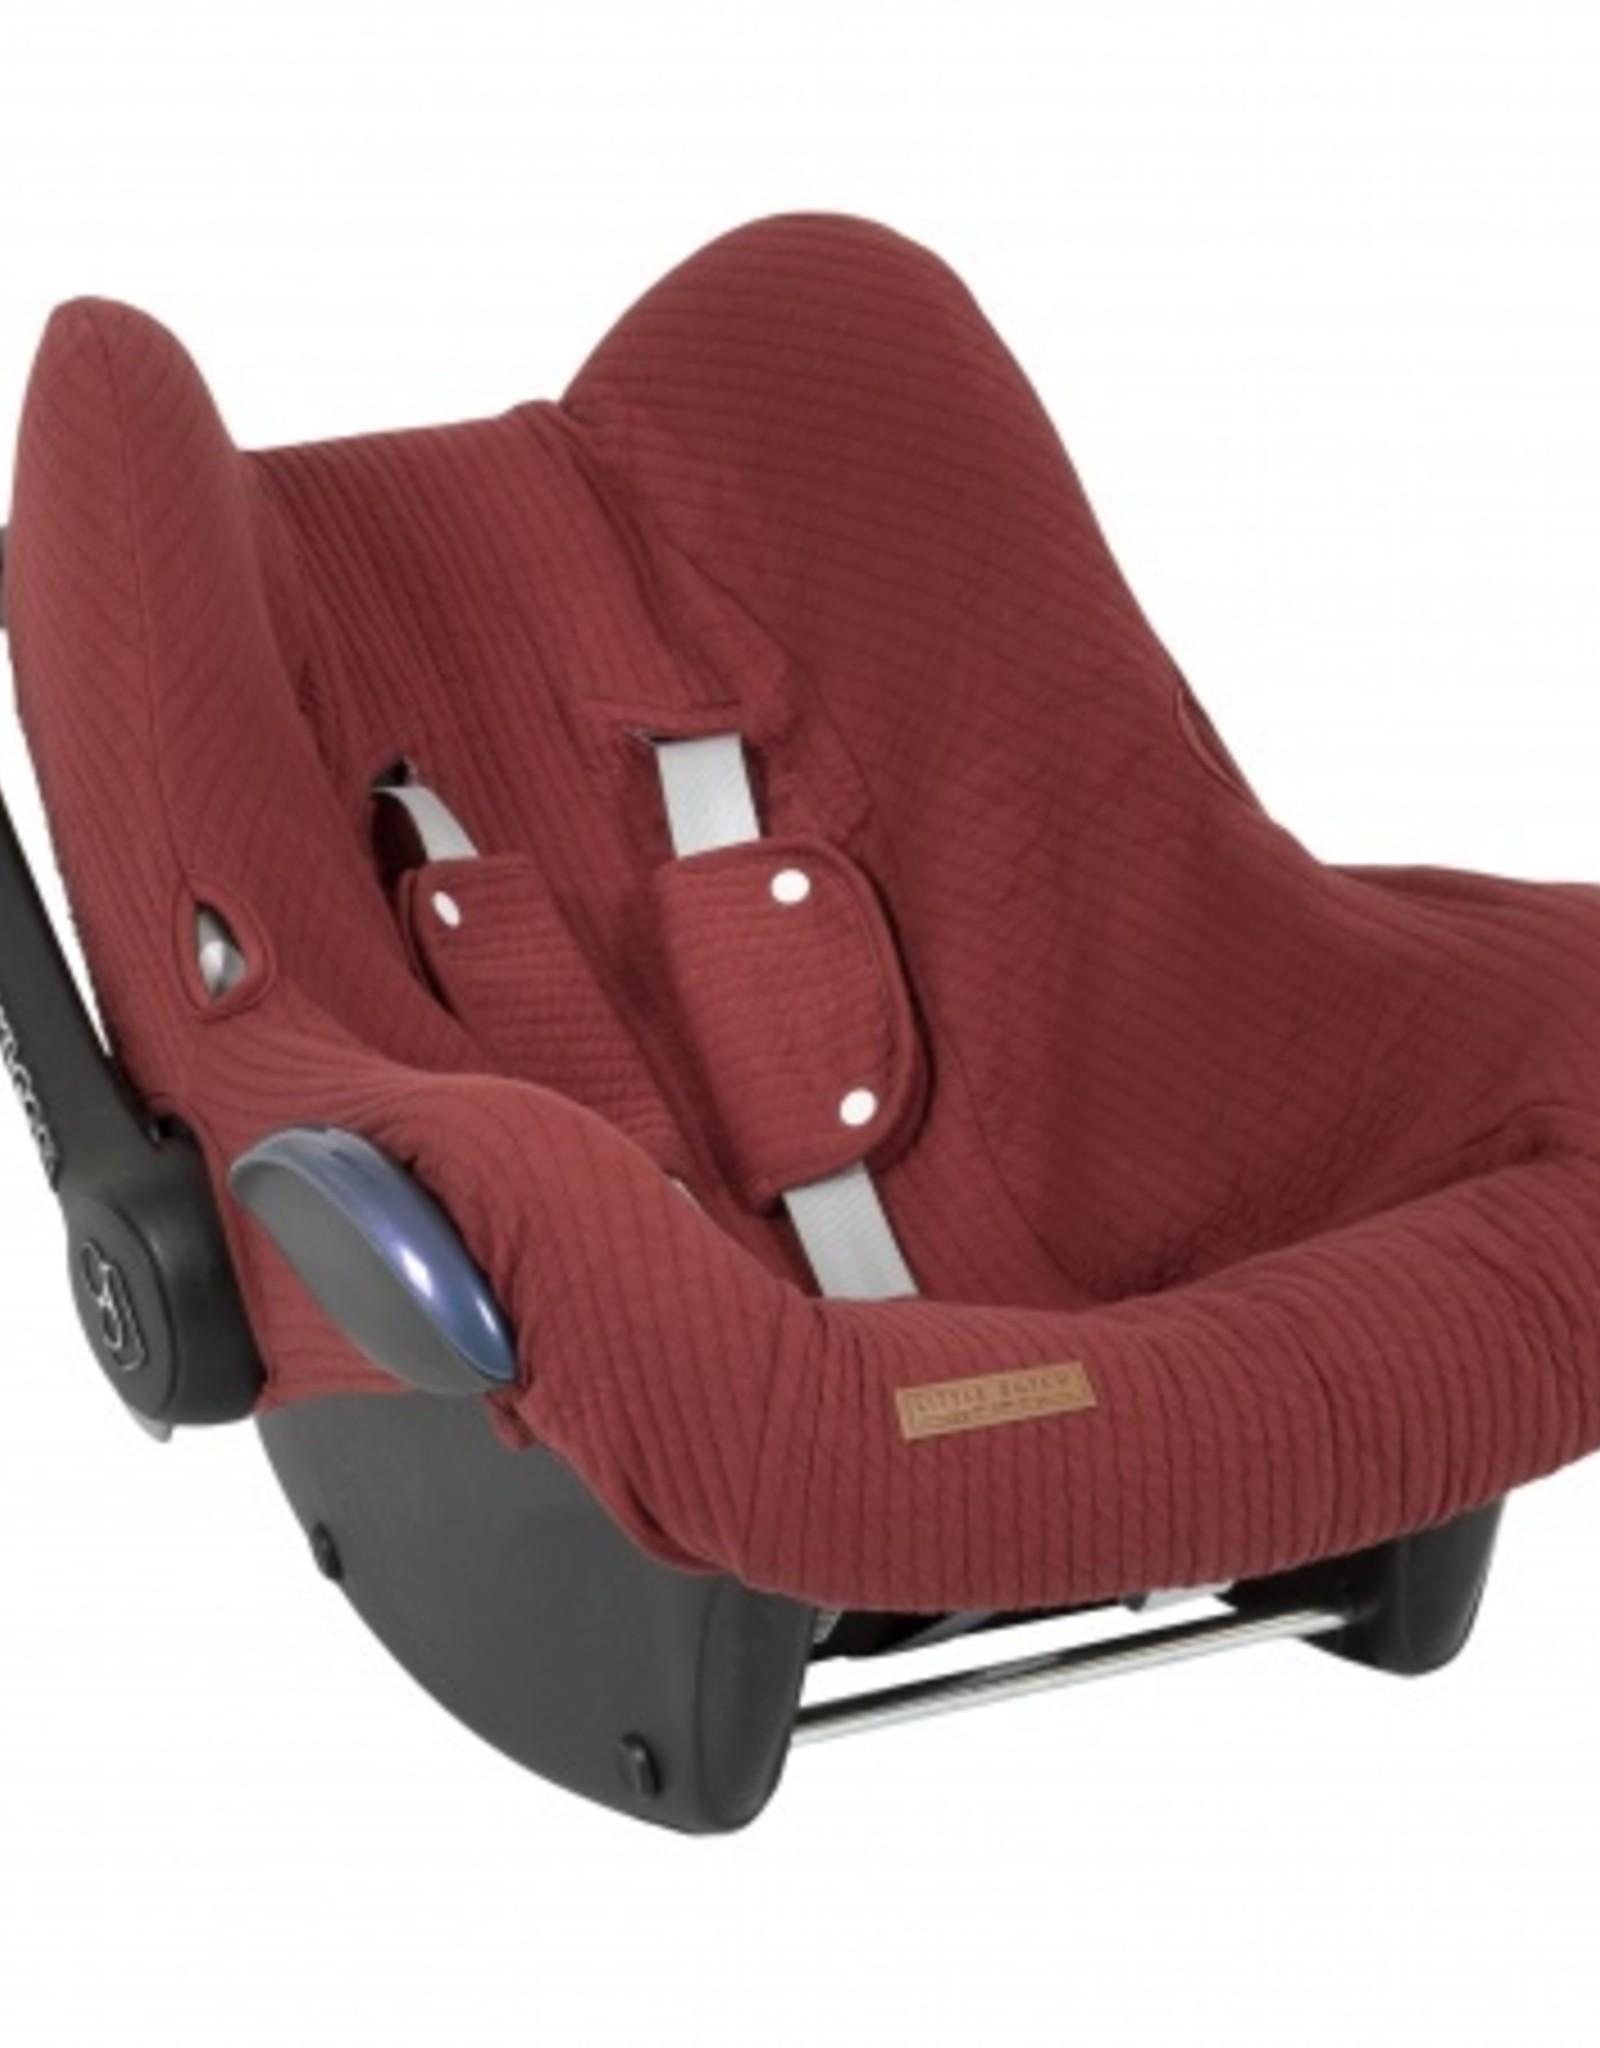 Little Dutch Little Dutch Car seat cover Indian Red